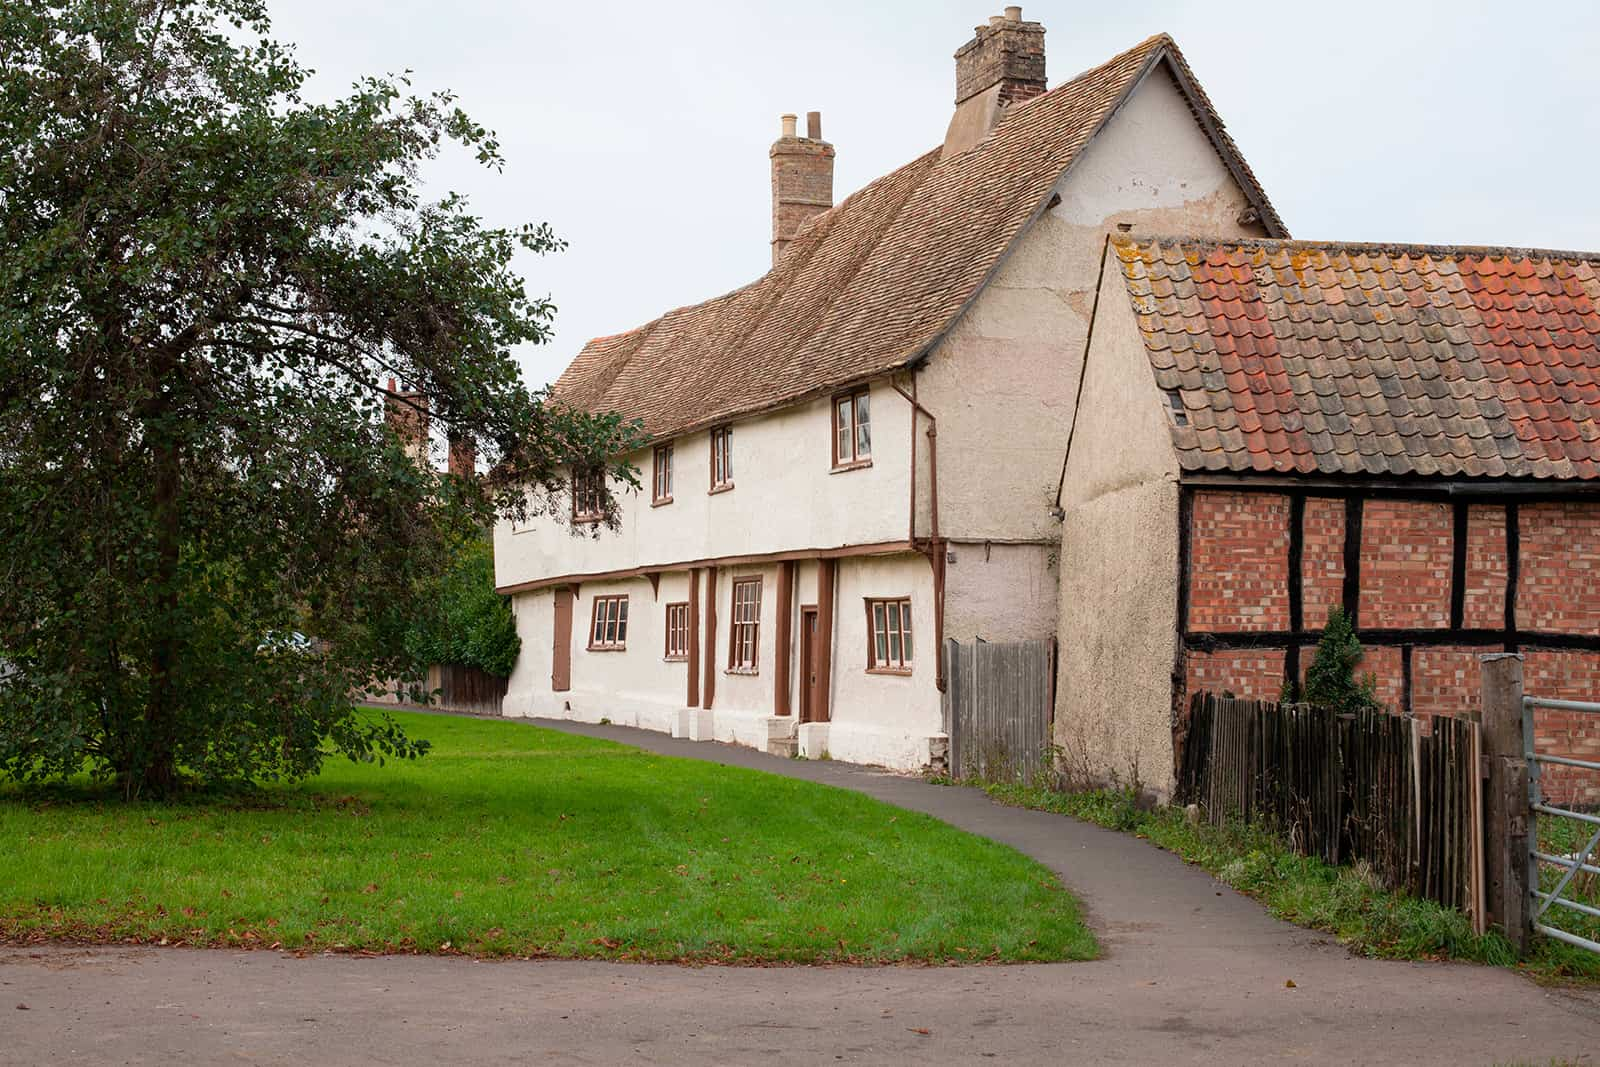 Manor Farm in Spaldwick